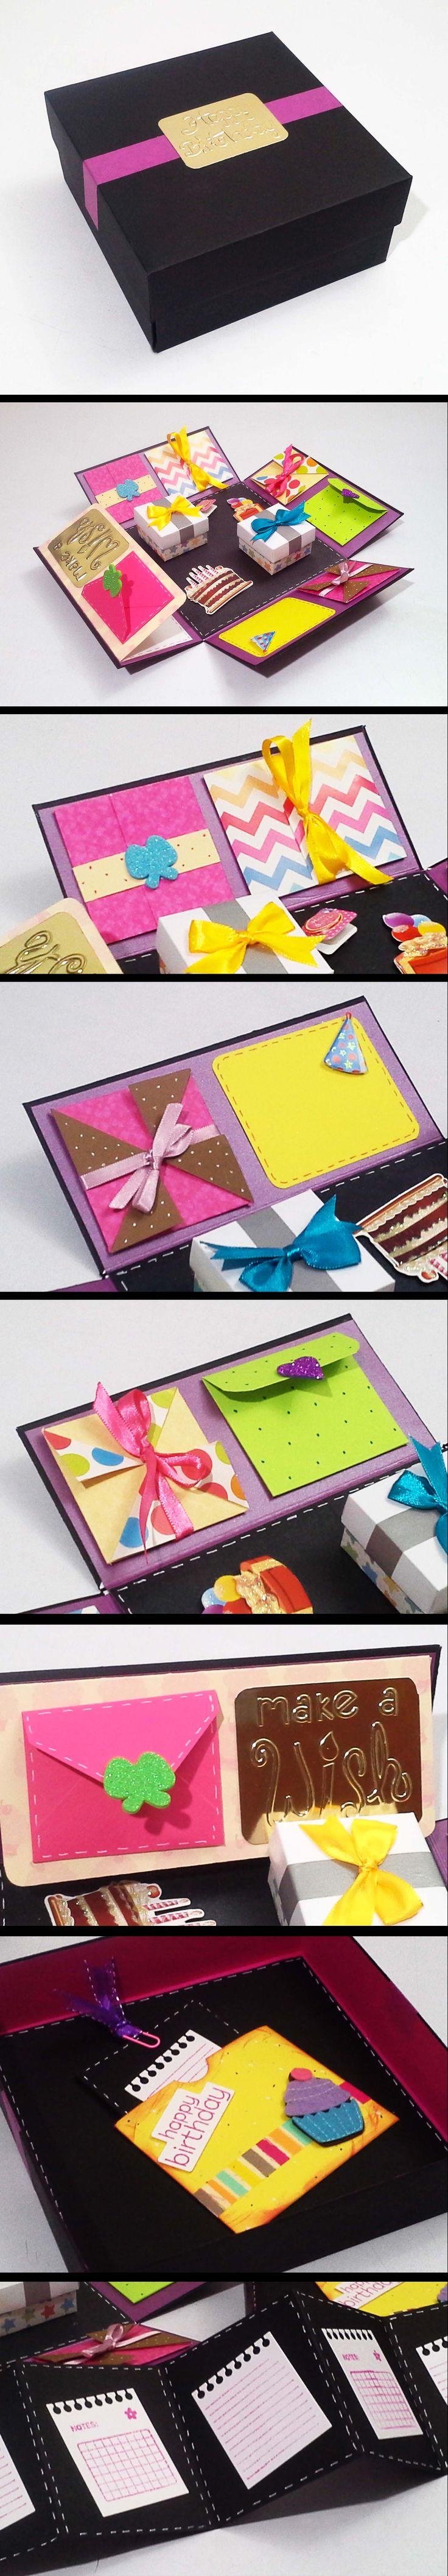 idée carte anniv avec cadeau inclus....